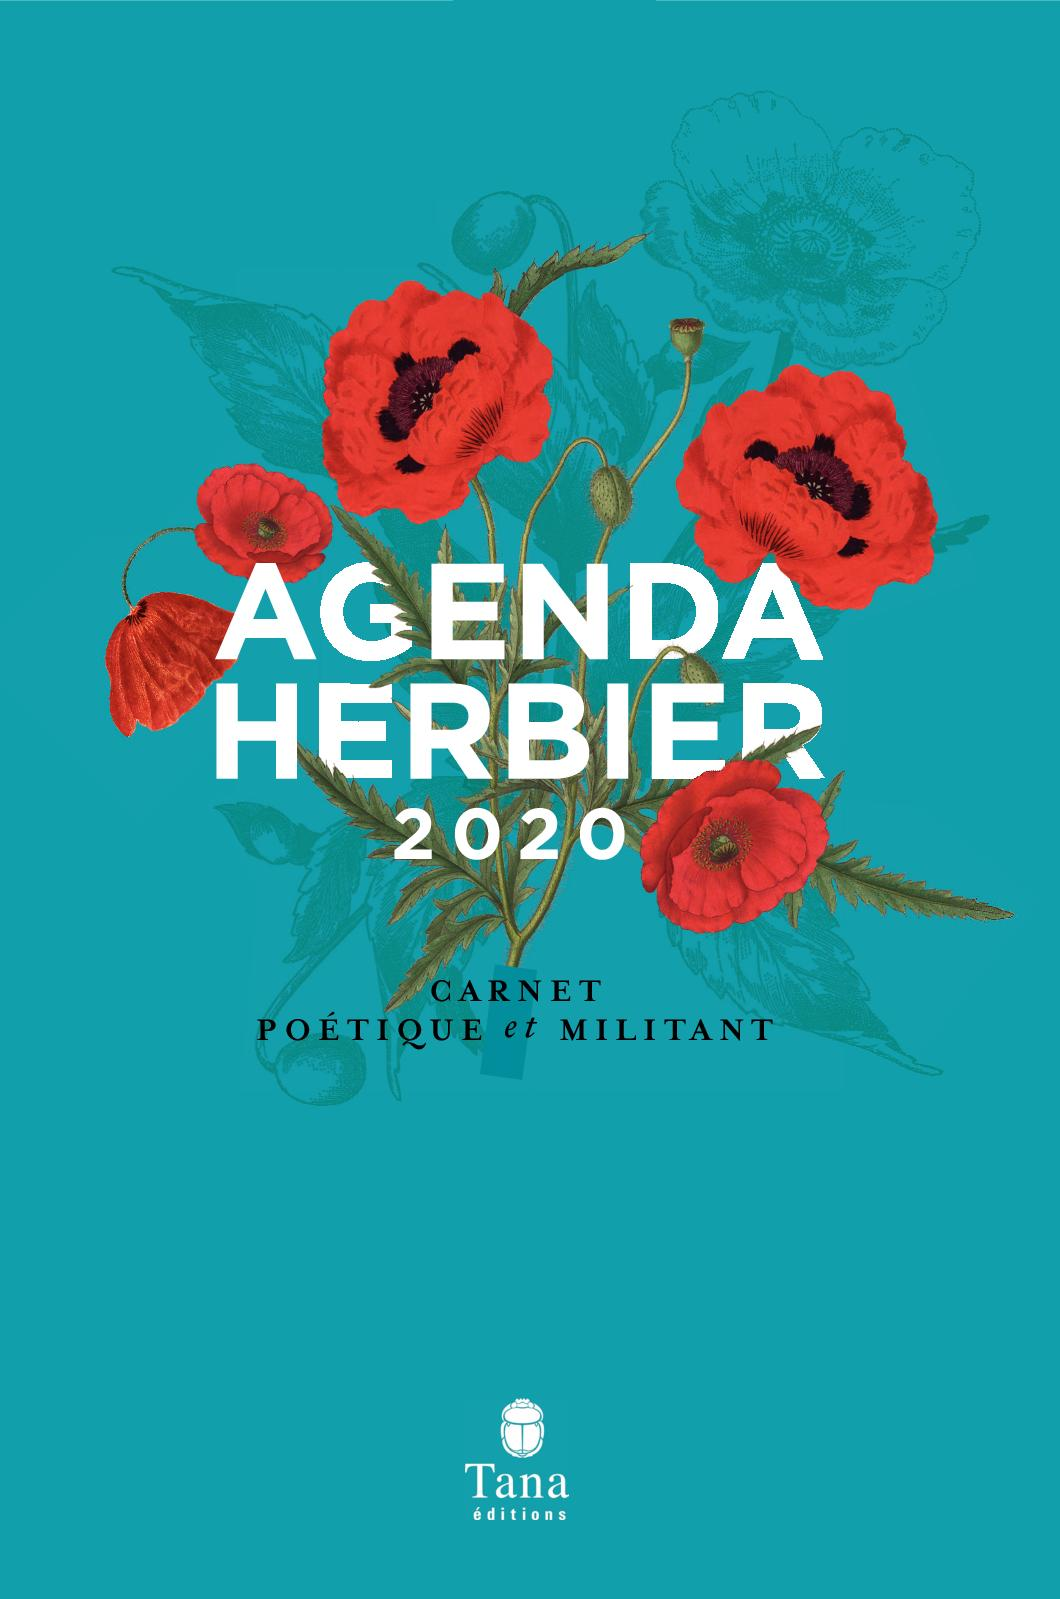 Agenda Herbier 2020